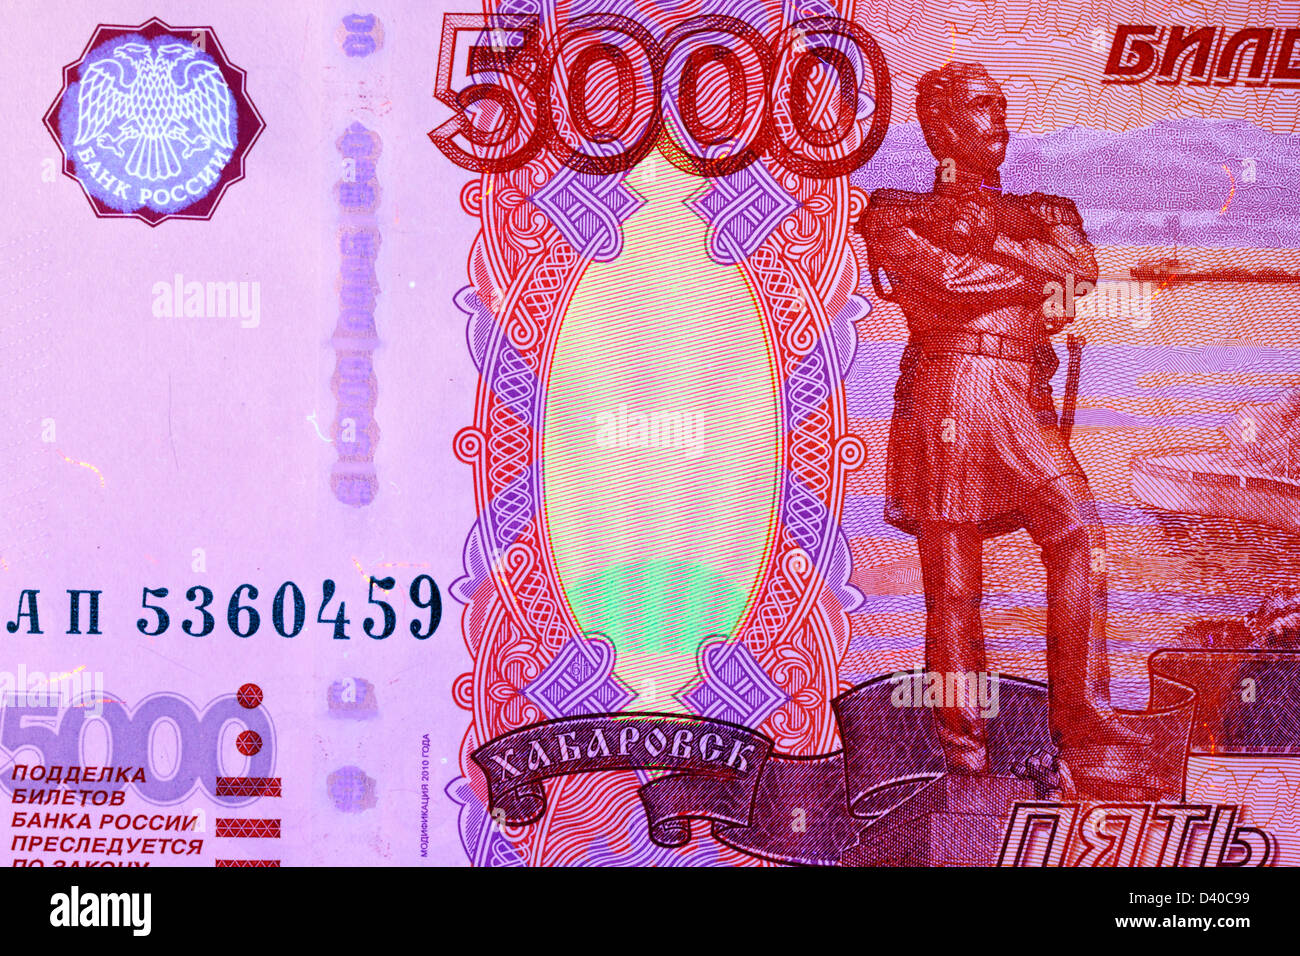 5000 Rubles banknote, Monument to Nikolay Muravyov-Amursky in Khabarovsk, Russia, 2010, under UV light - Stock Image